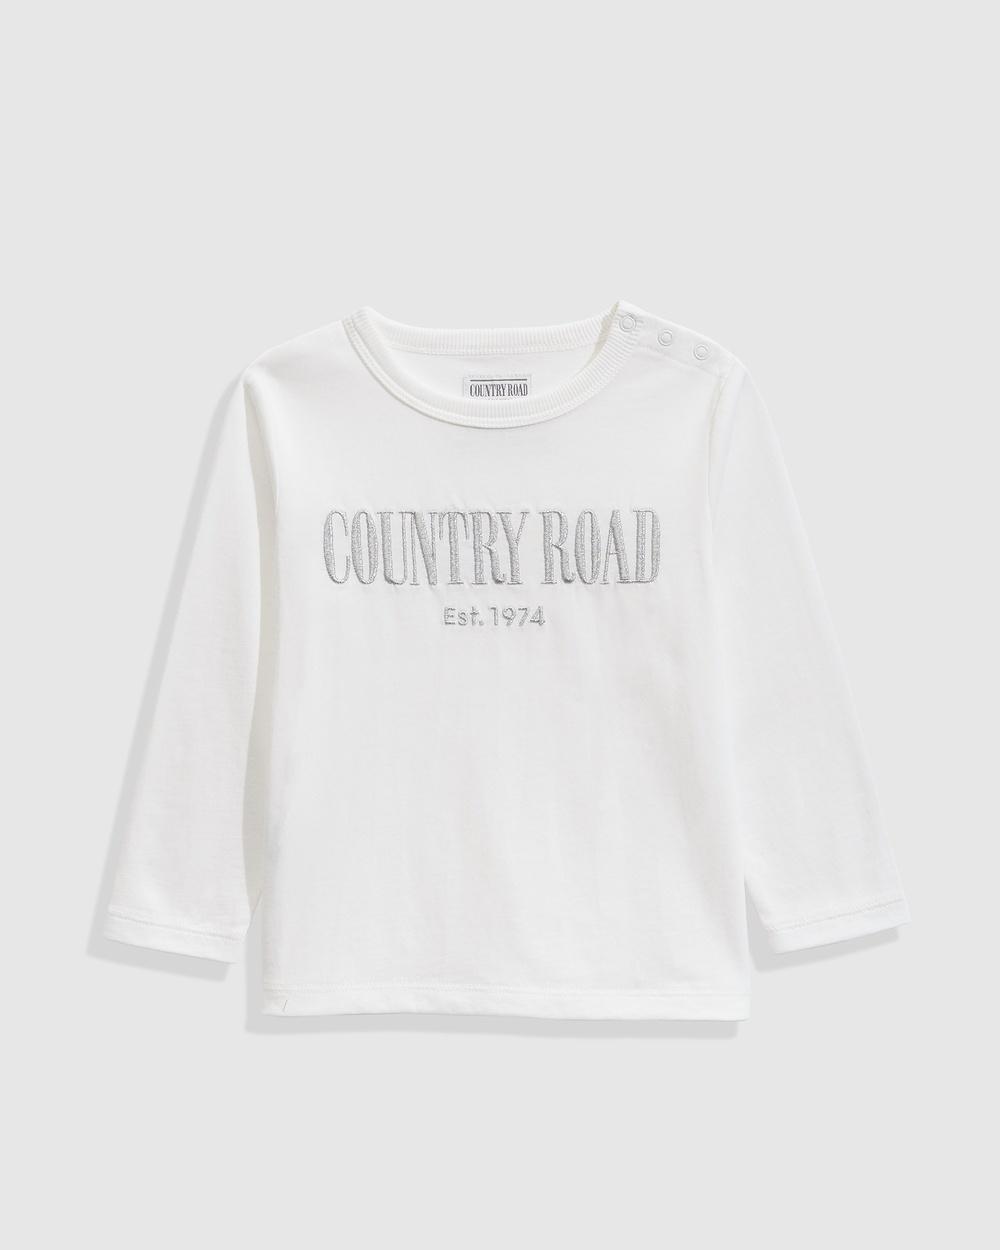 Country Road Verified Australian Cotton Long Sleeve Heritage T shirt T-Shirts & Singlets silver T-shirt Australia